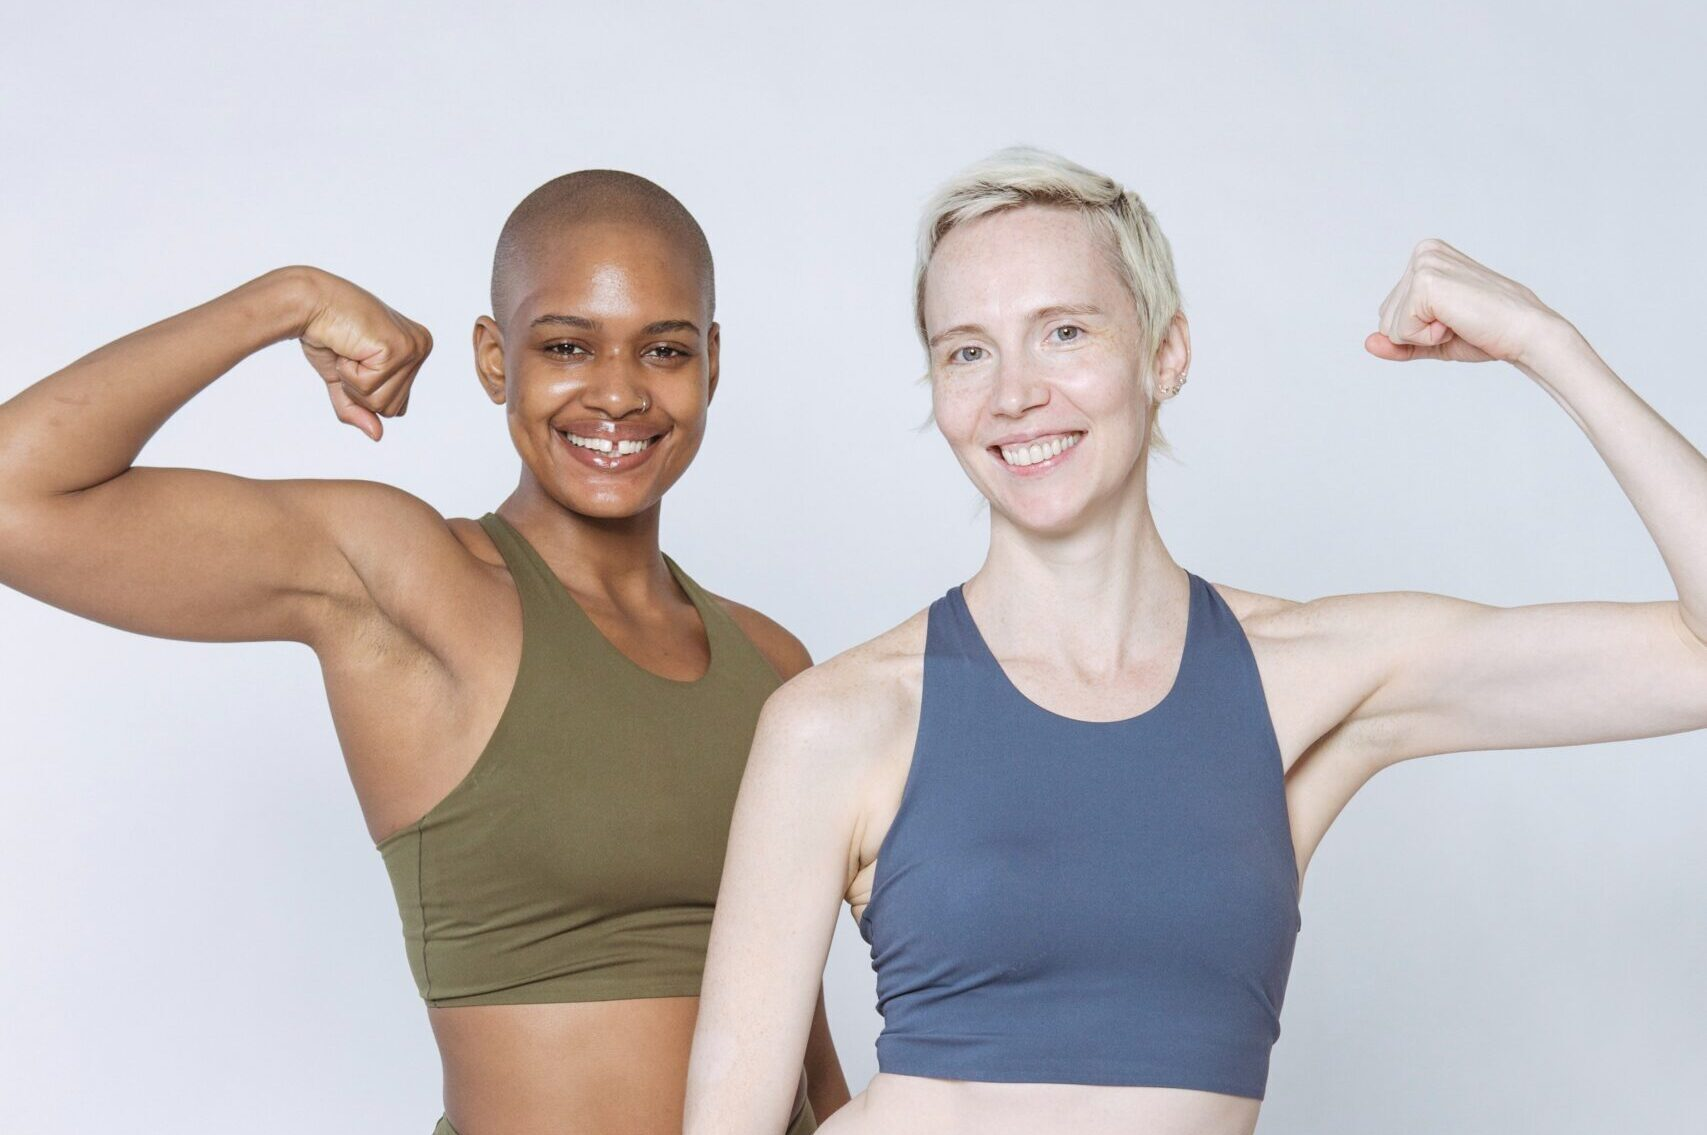 dos chicas sacando musculo del brazo